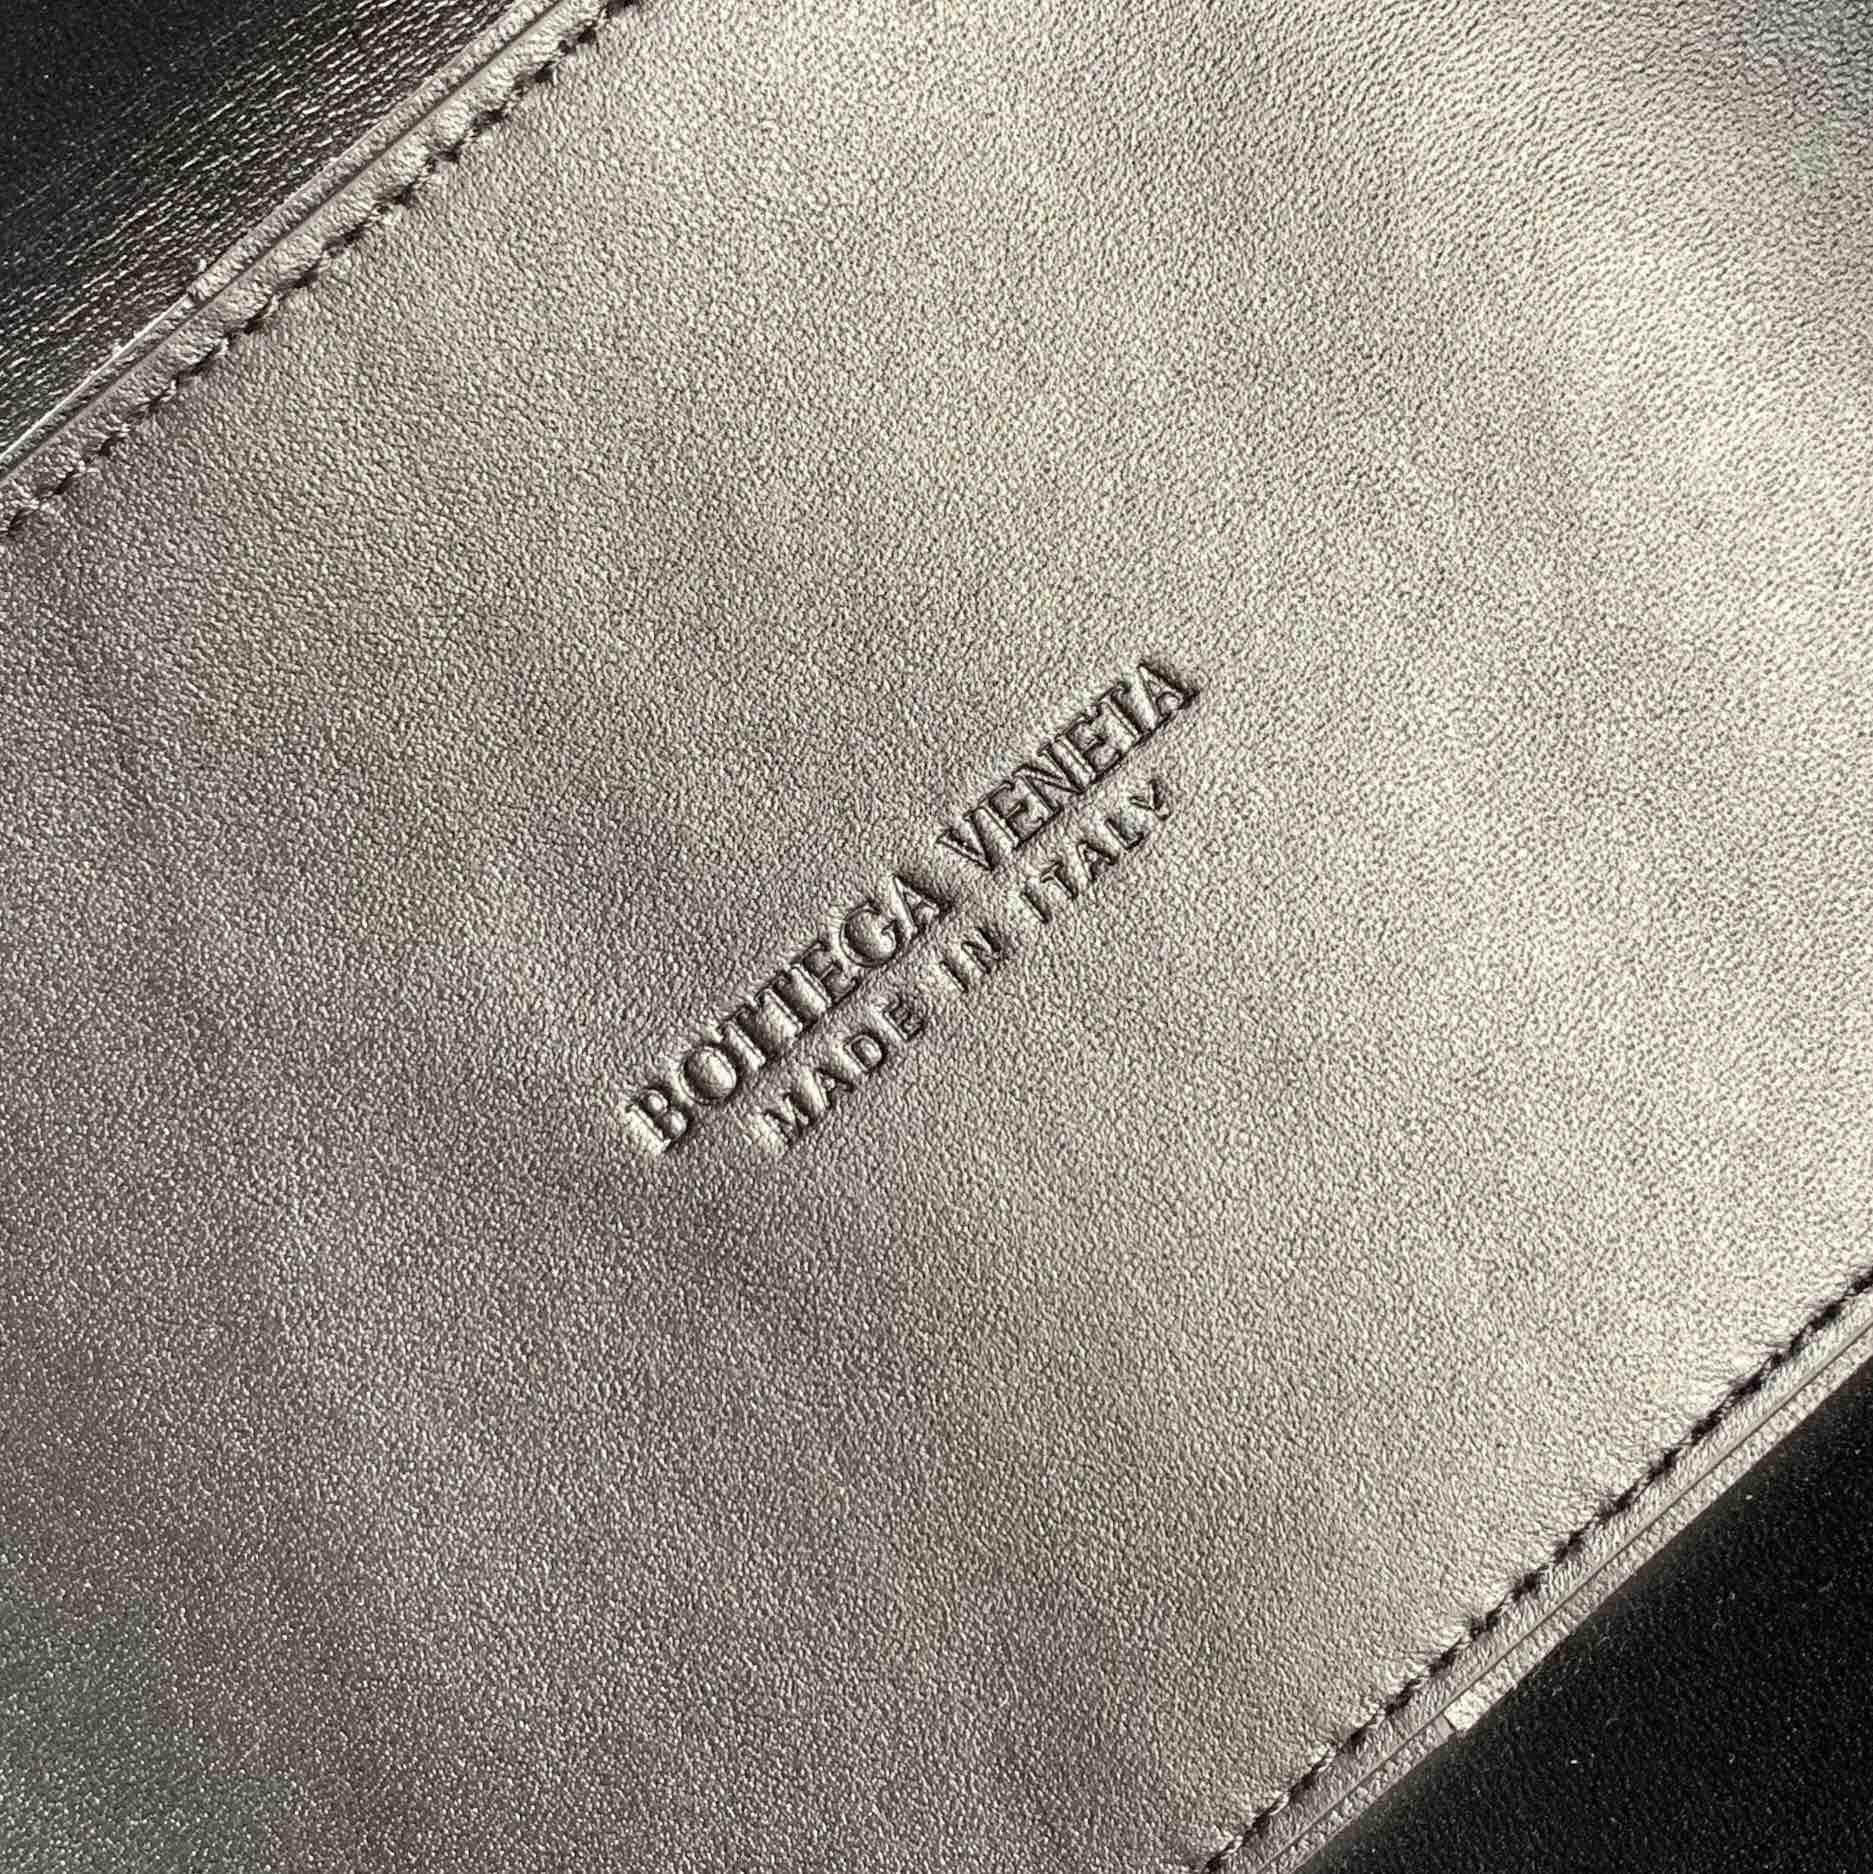 【P1800】BottegaVeneta 小牛皮SLIP托特手袋 羊皮白拼黑 36*24*12